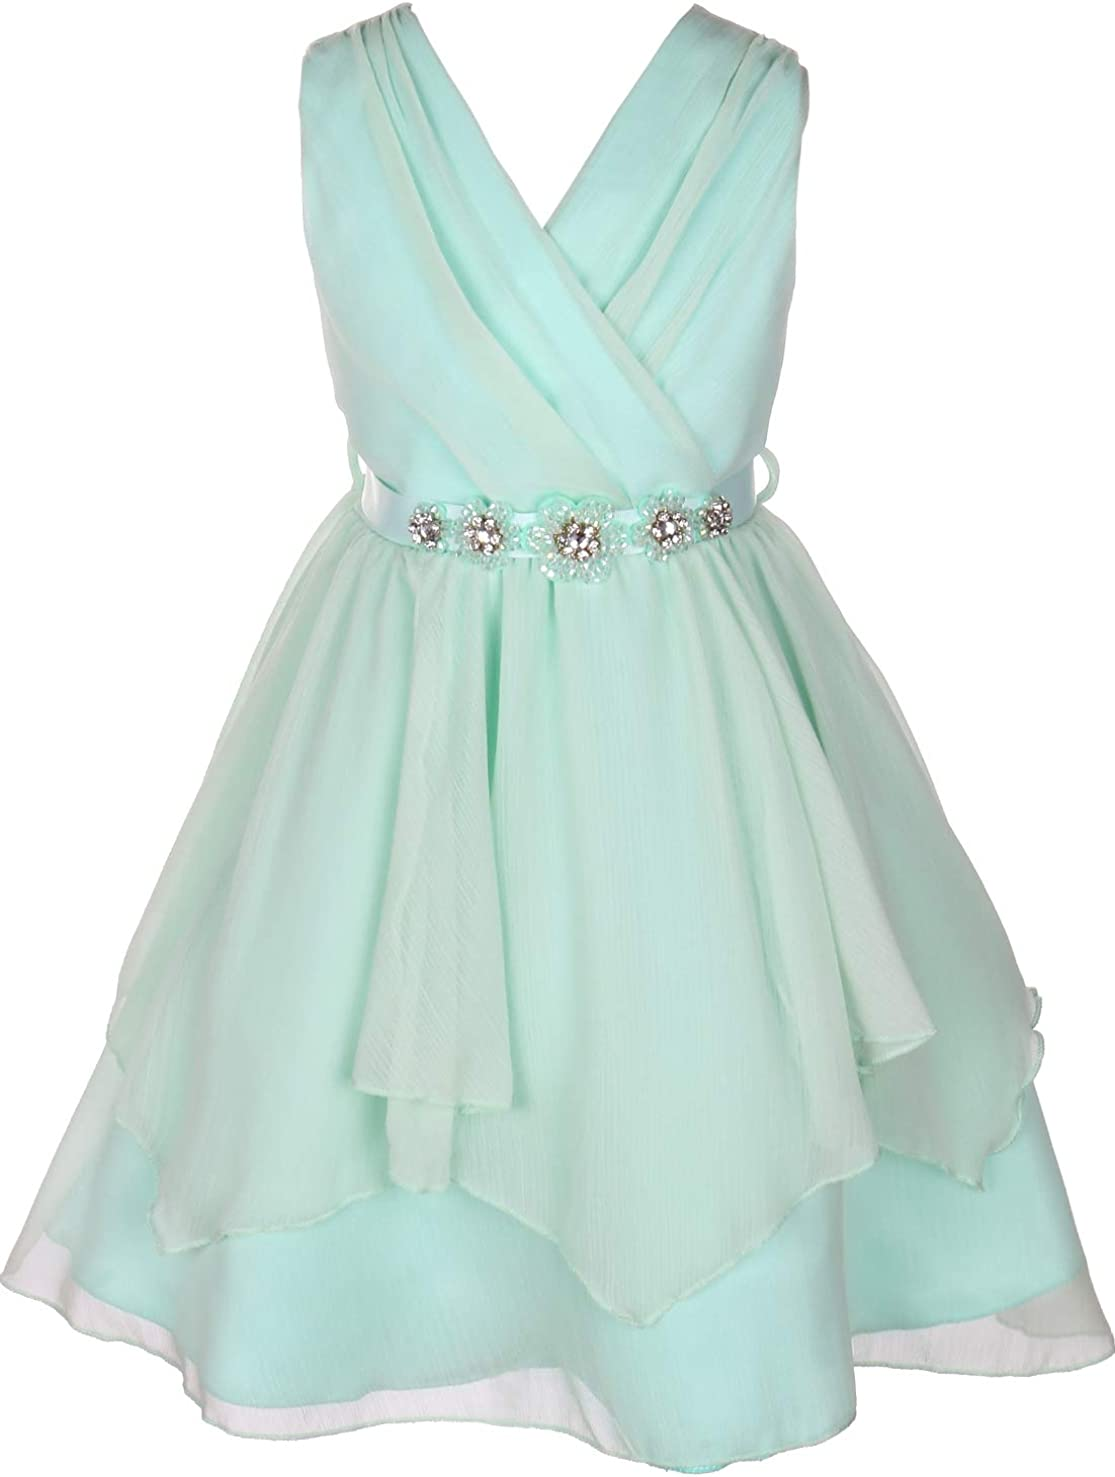 BNY Corner V Neck Chiffon Asymmetrical Bridesmaid Easter Flower Girl Dress 4-14